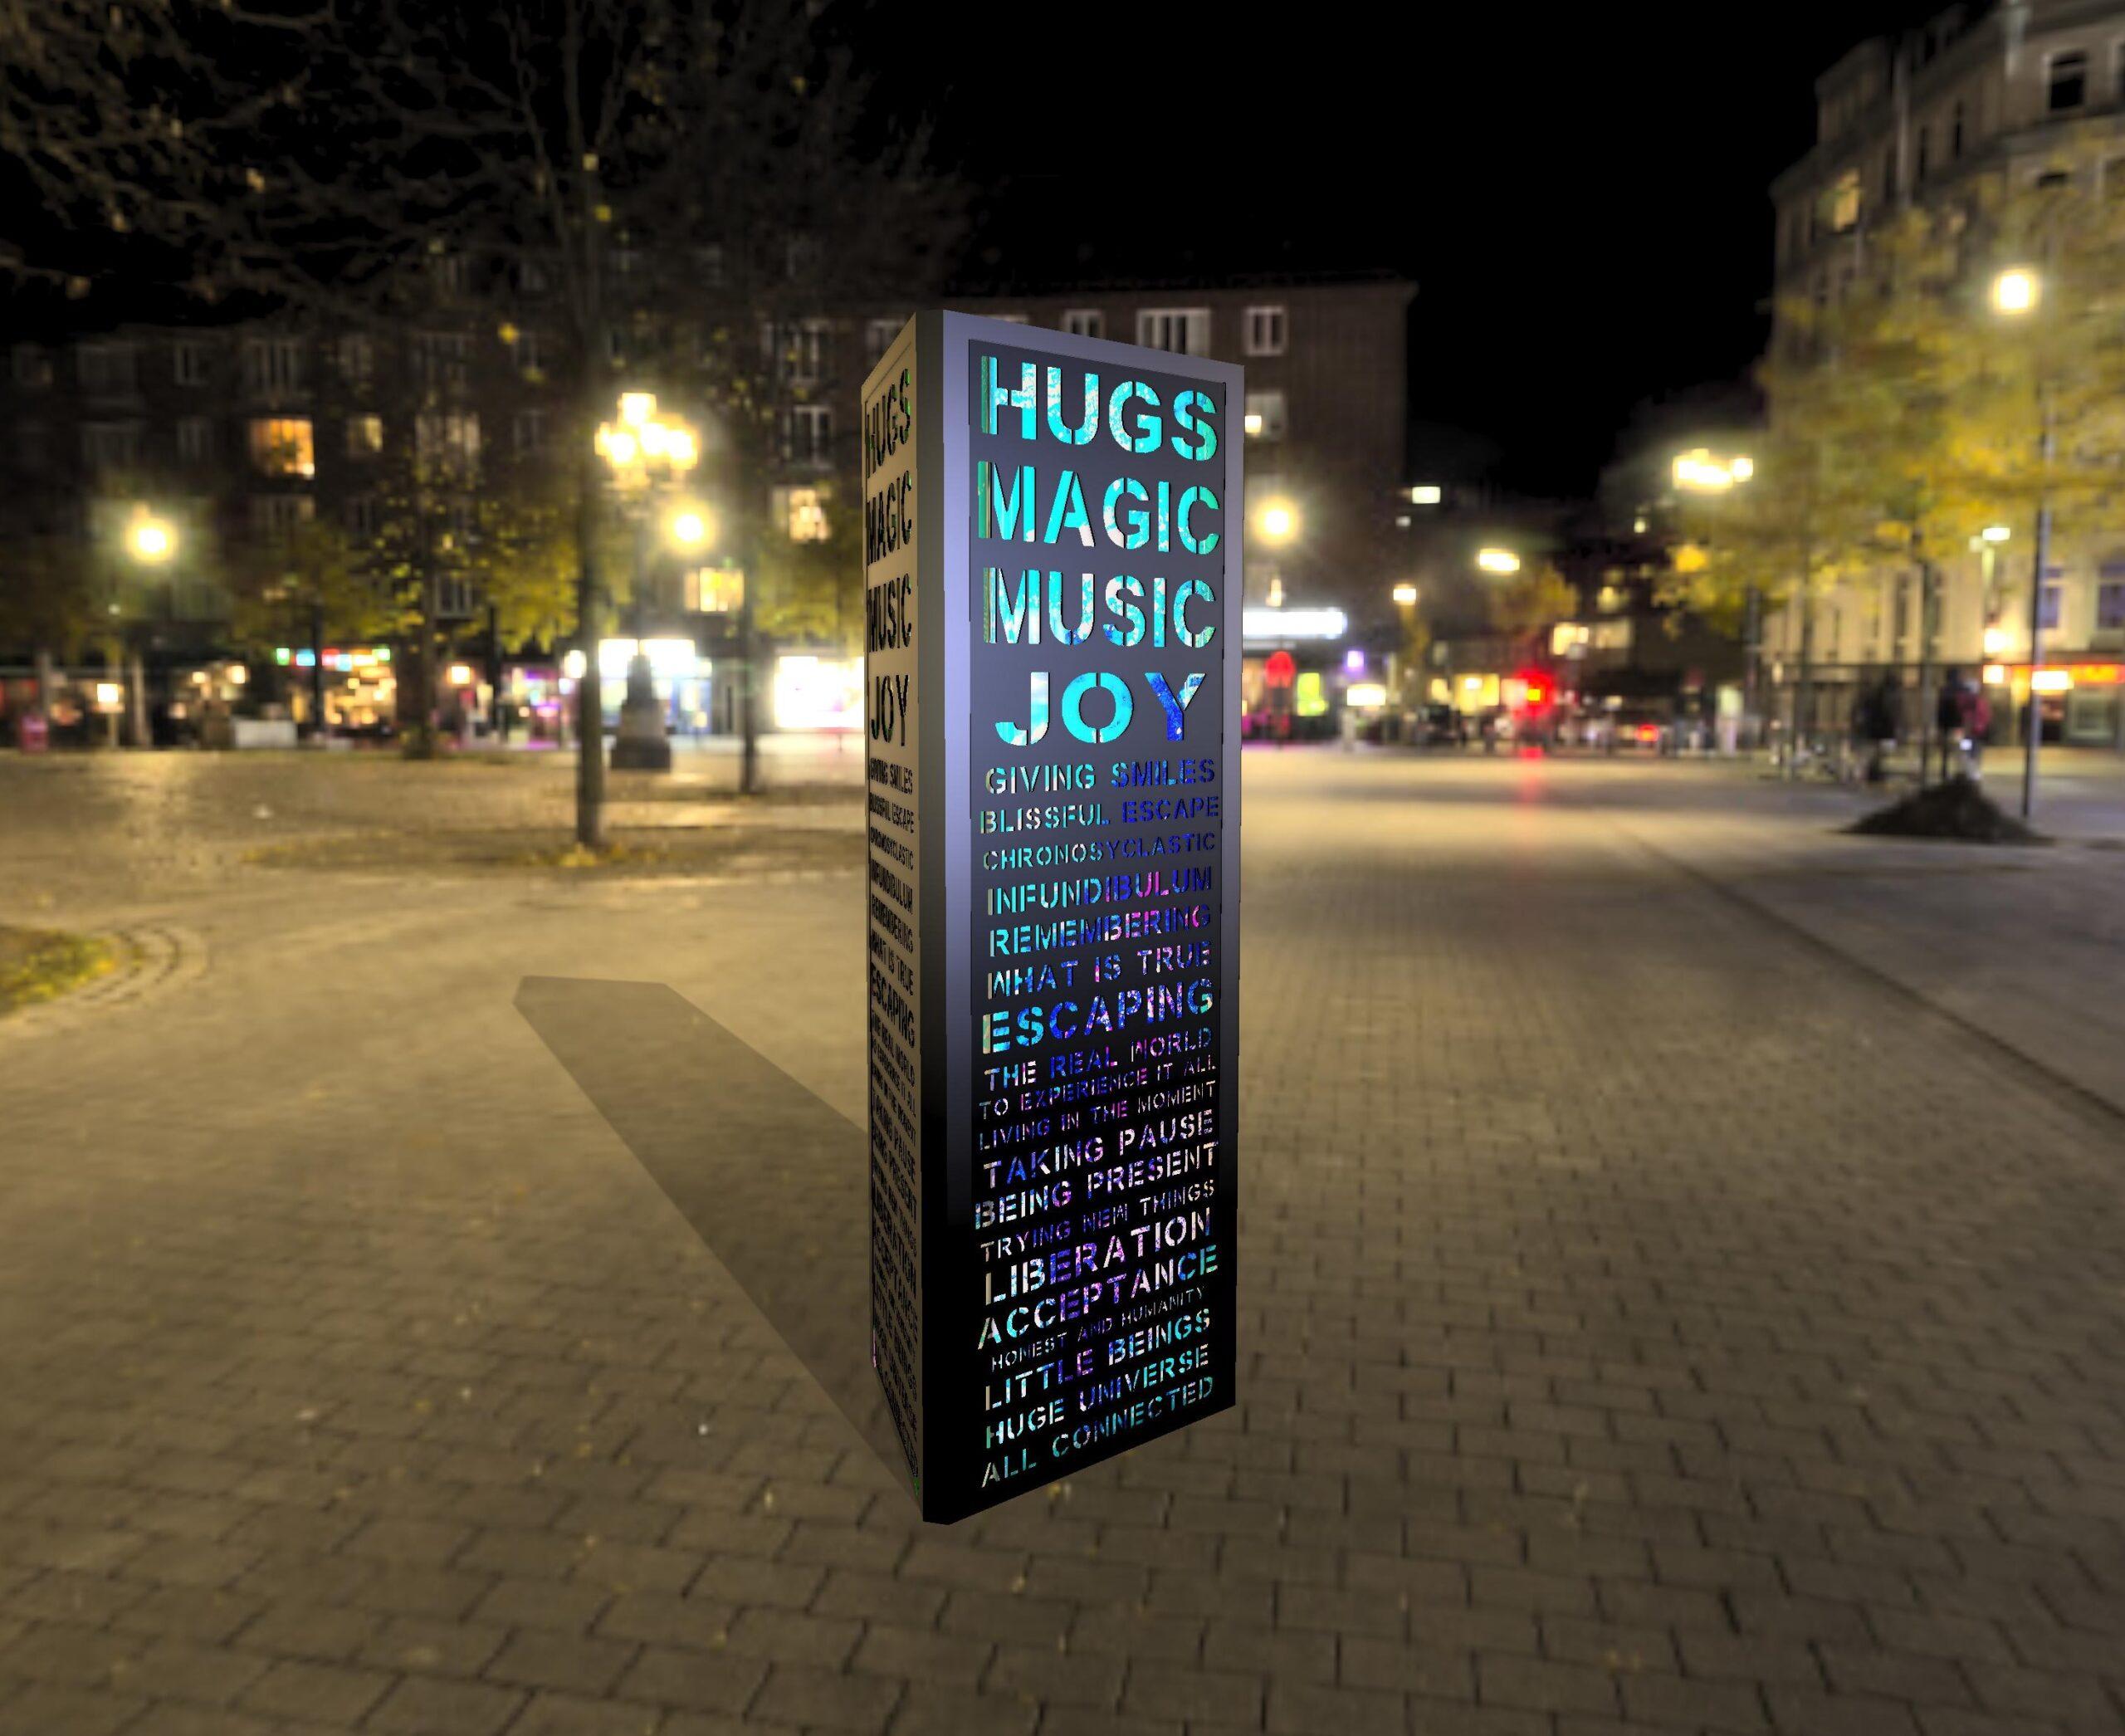 http://orloskystudio.com/wp-content/uploads/2021/10/POP-Light-Box-Prism-Pillar-1-scaled.jpg